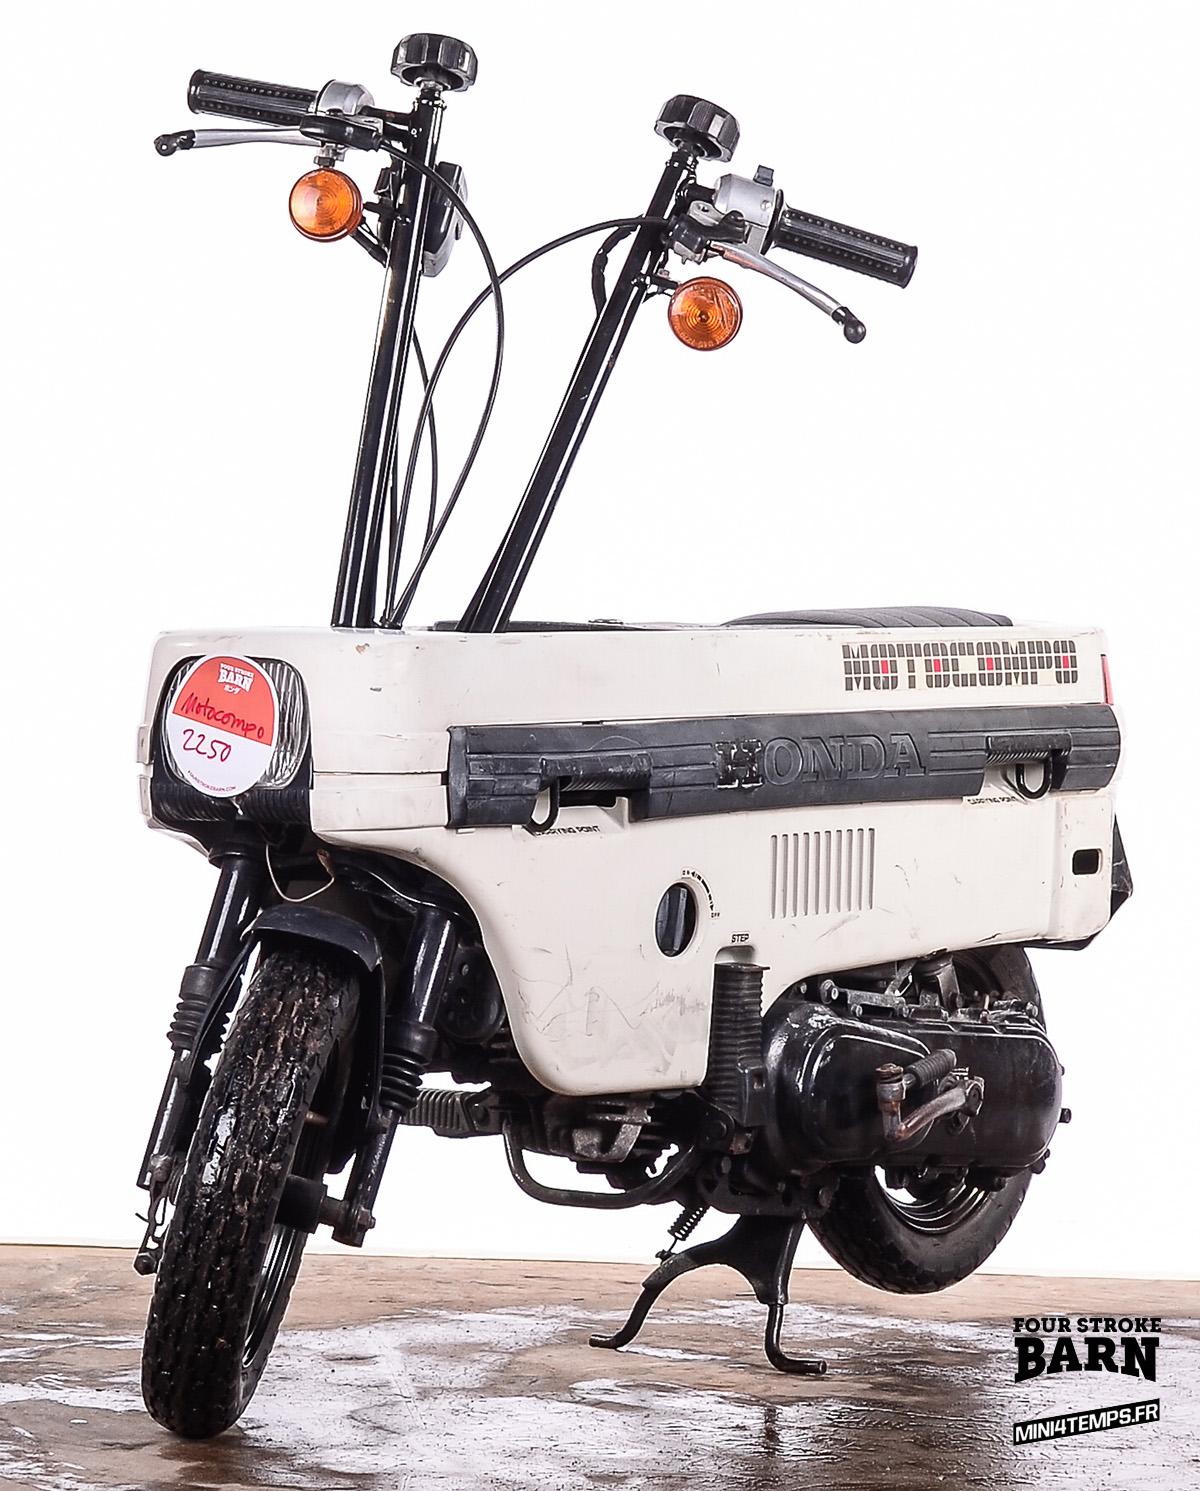 A VENDRE : Deux Honda Motocompo chez Four Stroke Barn - mini4temps.fr